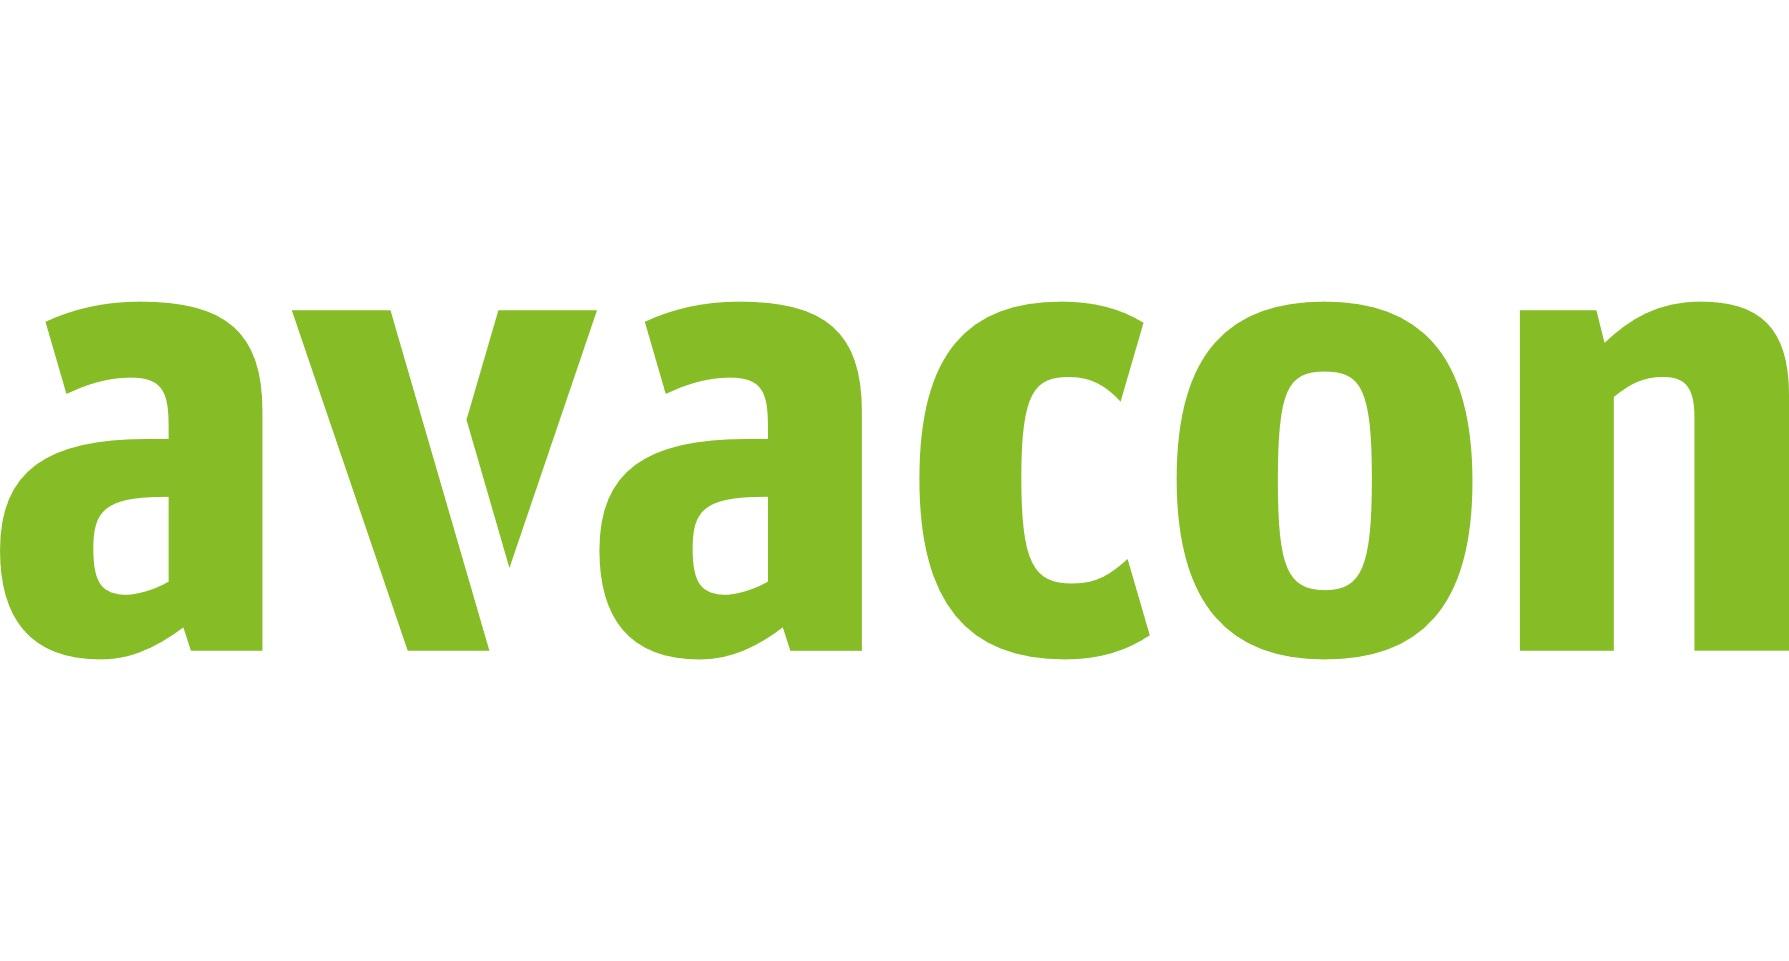 915150879_21501_avacon_logo_gruen_jepg_2020.jpg